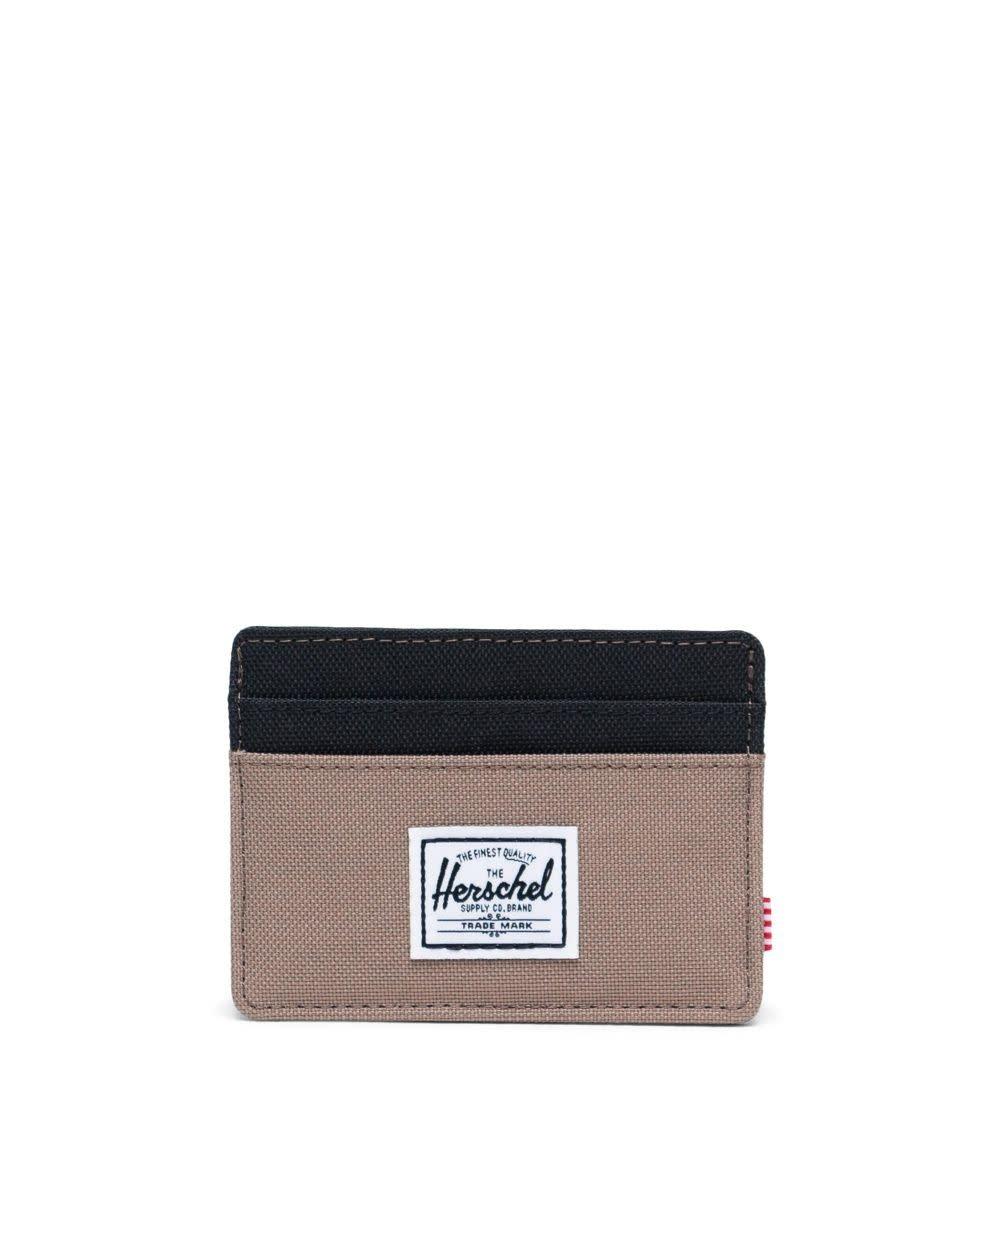 Herschel Supply Co. Herschel Charlie Wallet - Pine Bark/Black